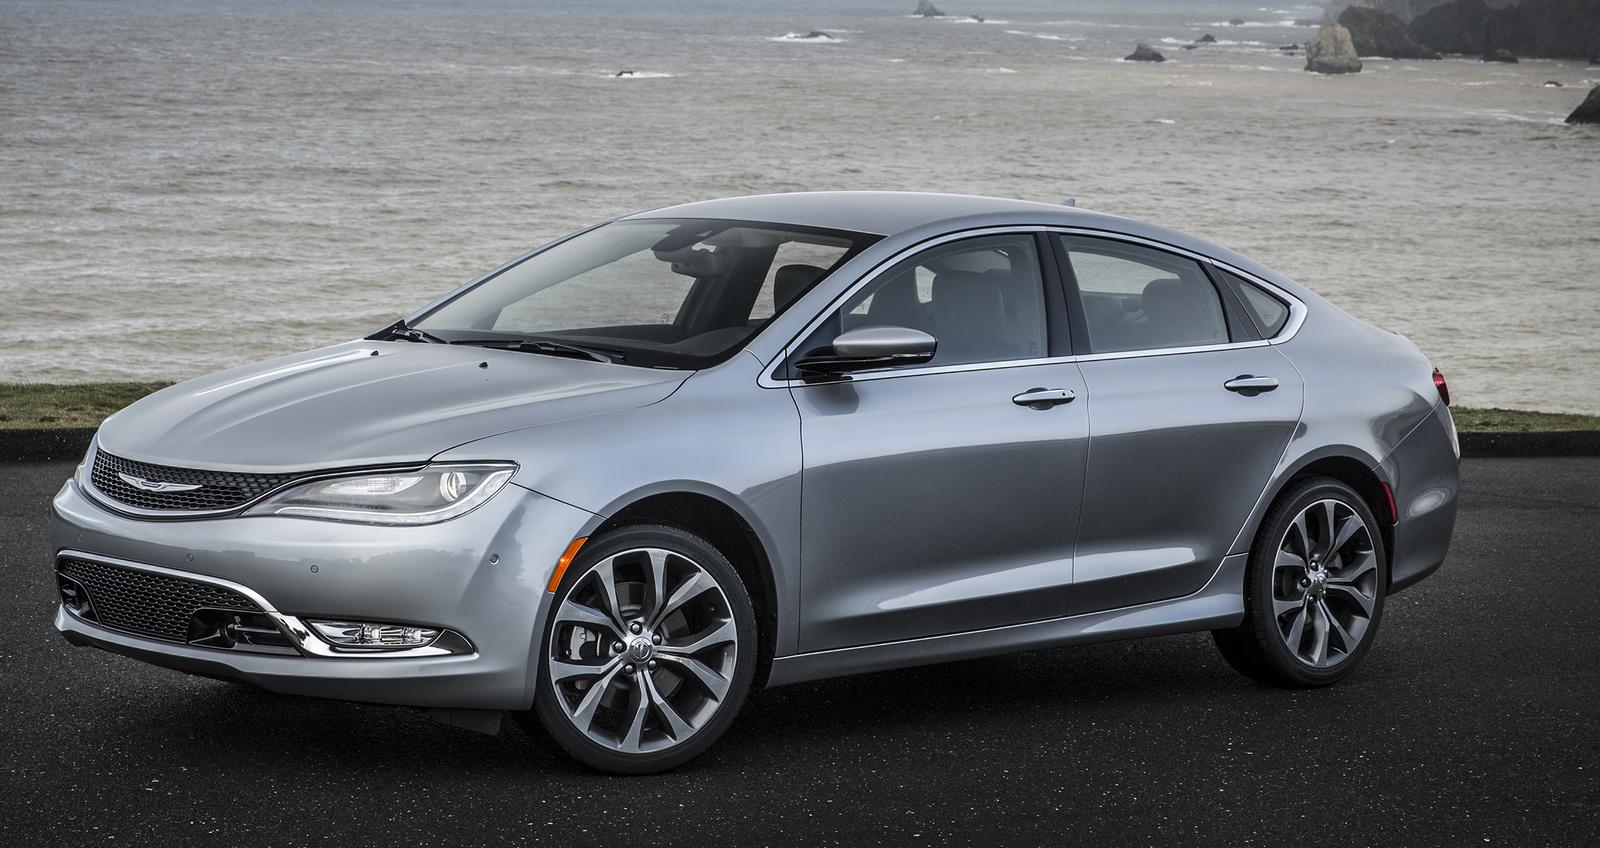 2016 Chrysler 200 Review CarGurus